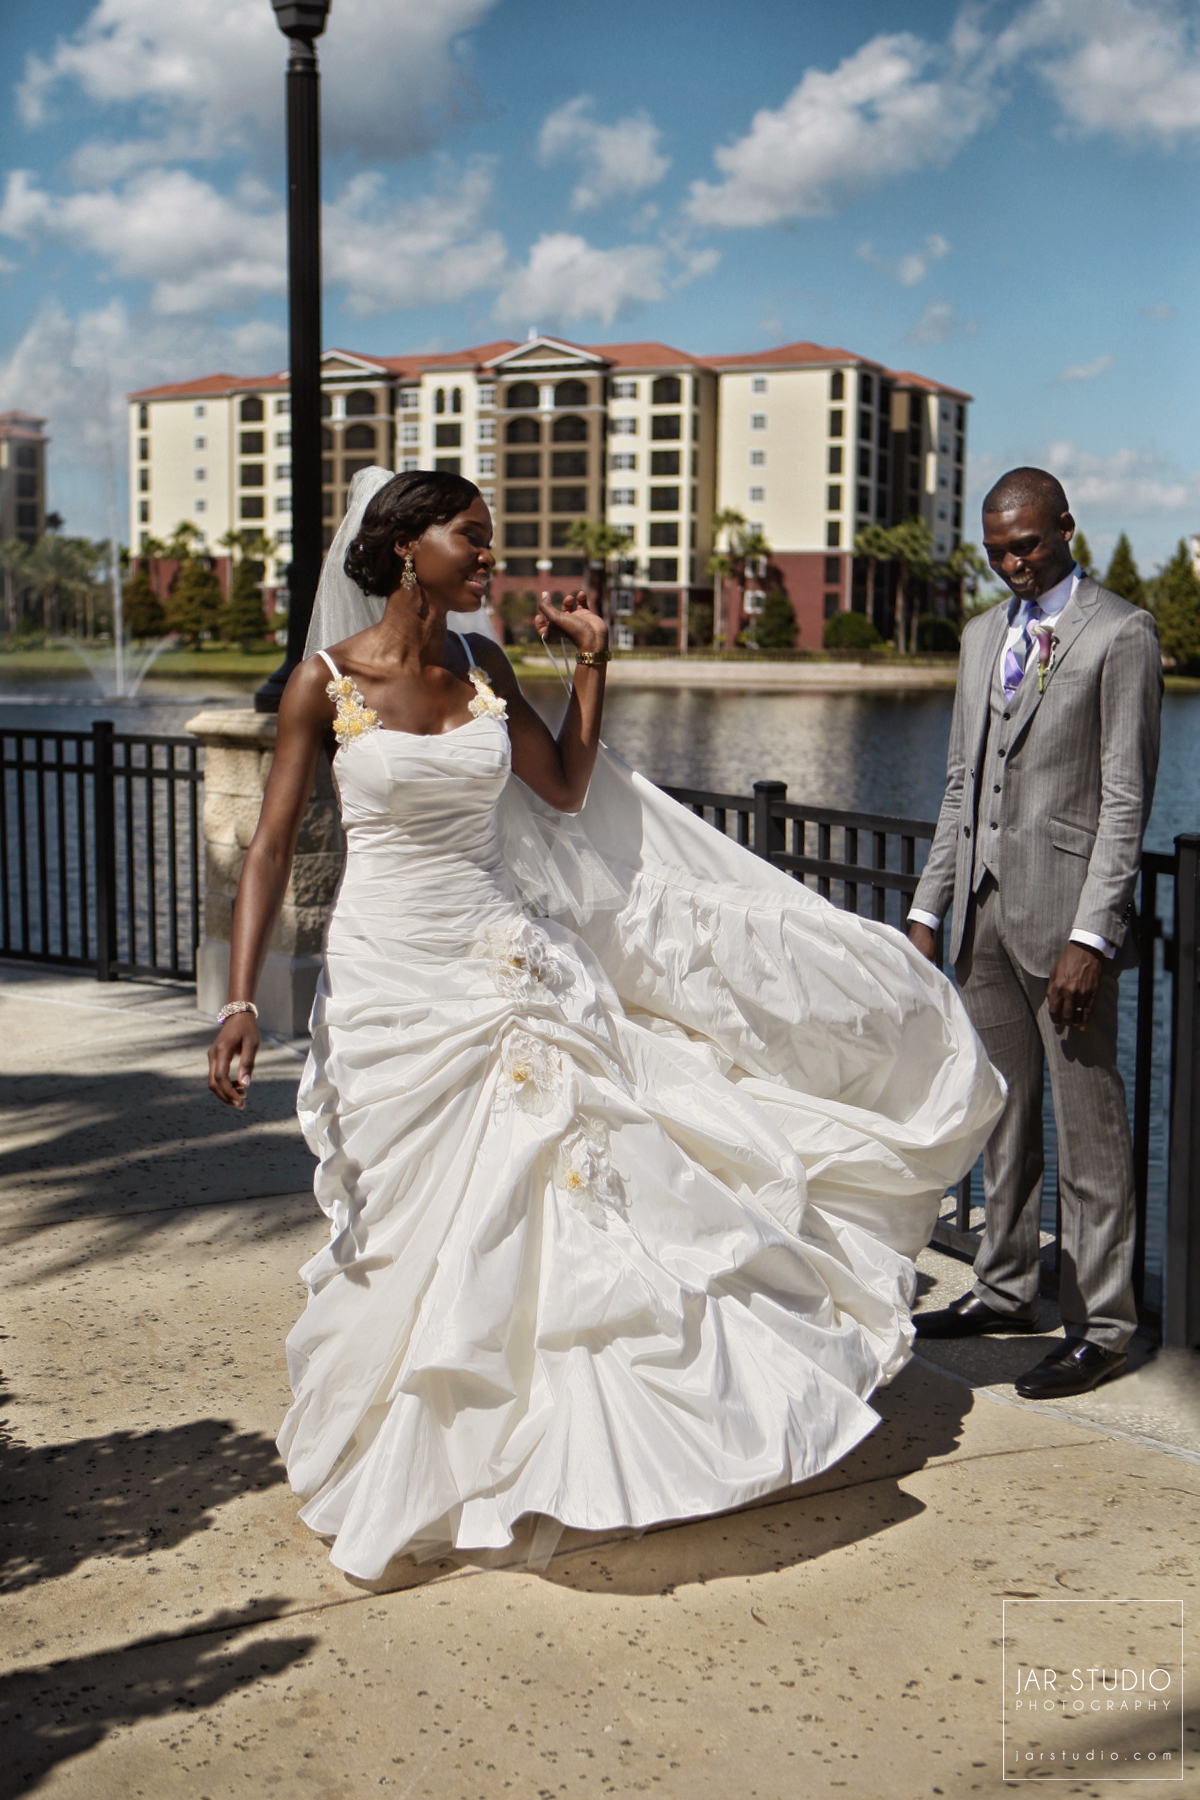 25-orlando-resorts-destination-wedding-photographer-jarstudio.JPG